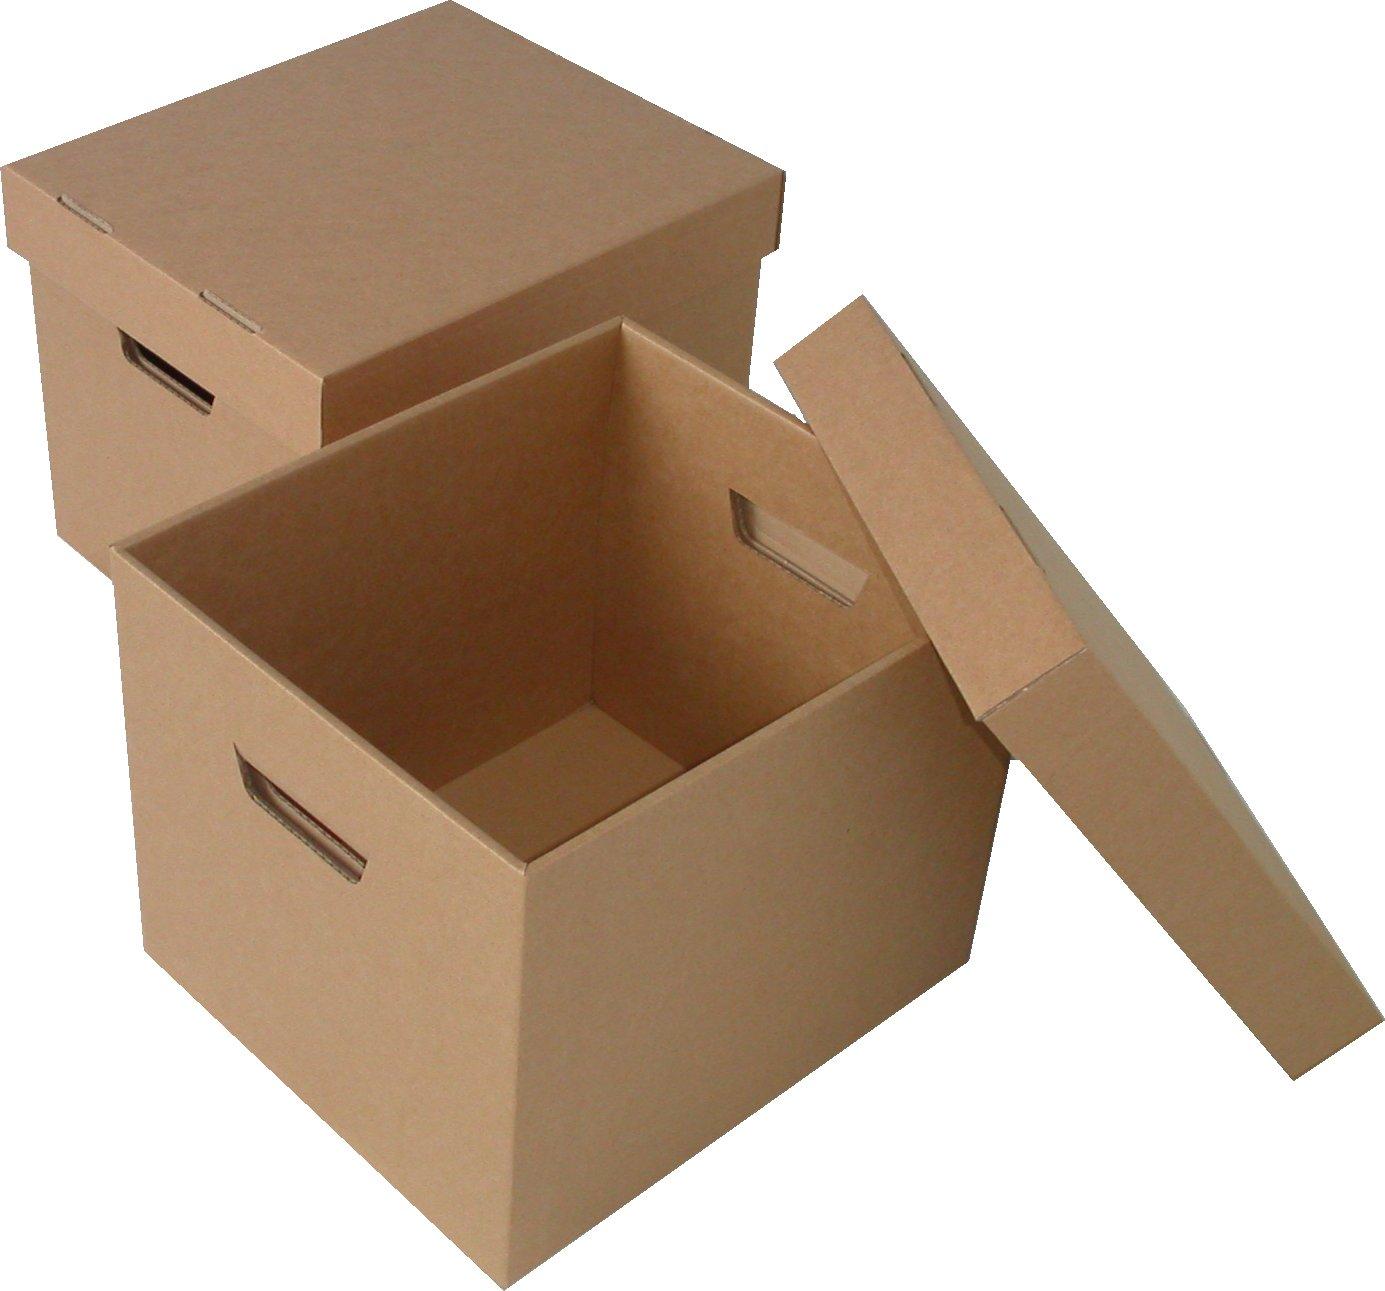 custom corrugated packing boxes online printroo australia. Black Bedroom Furniture Sets. Home Design Ideas